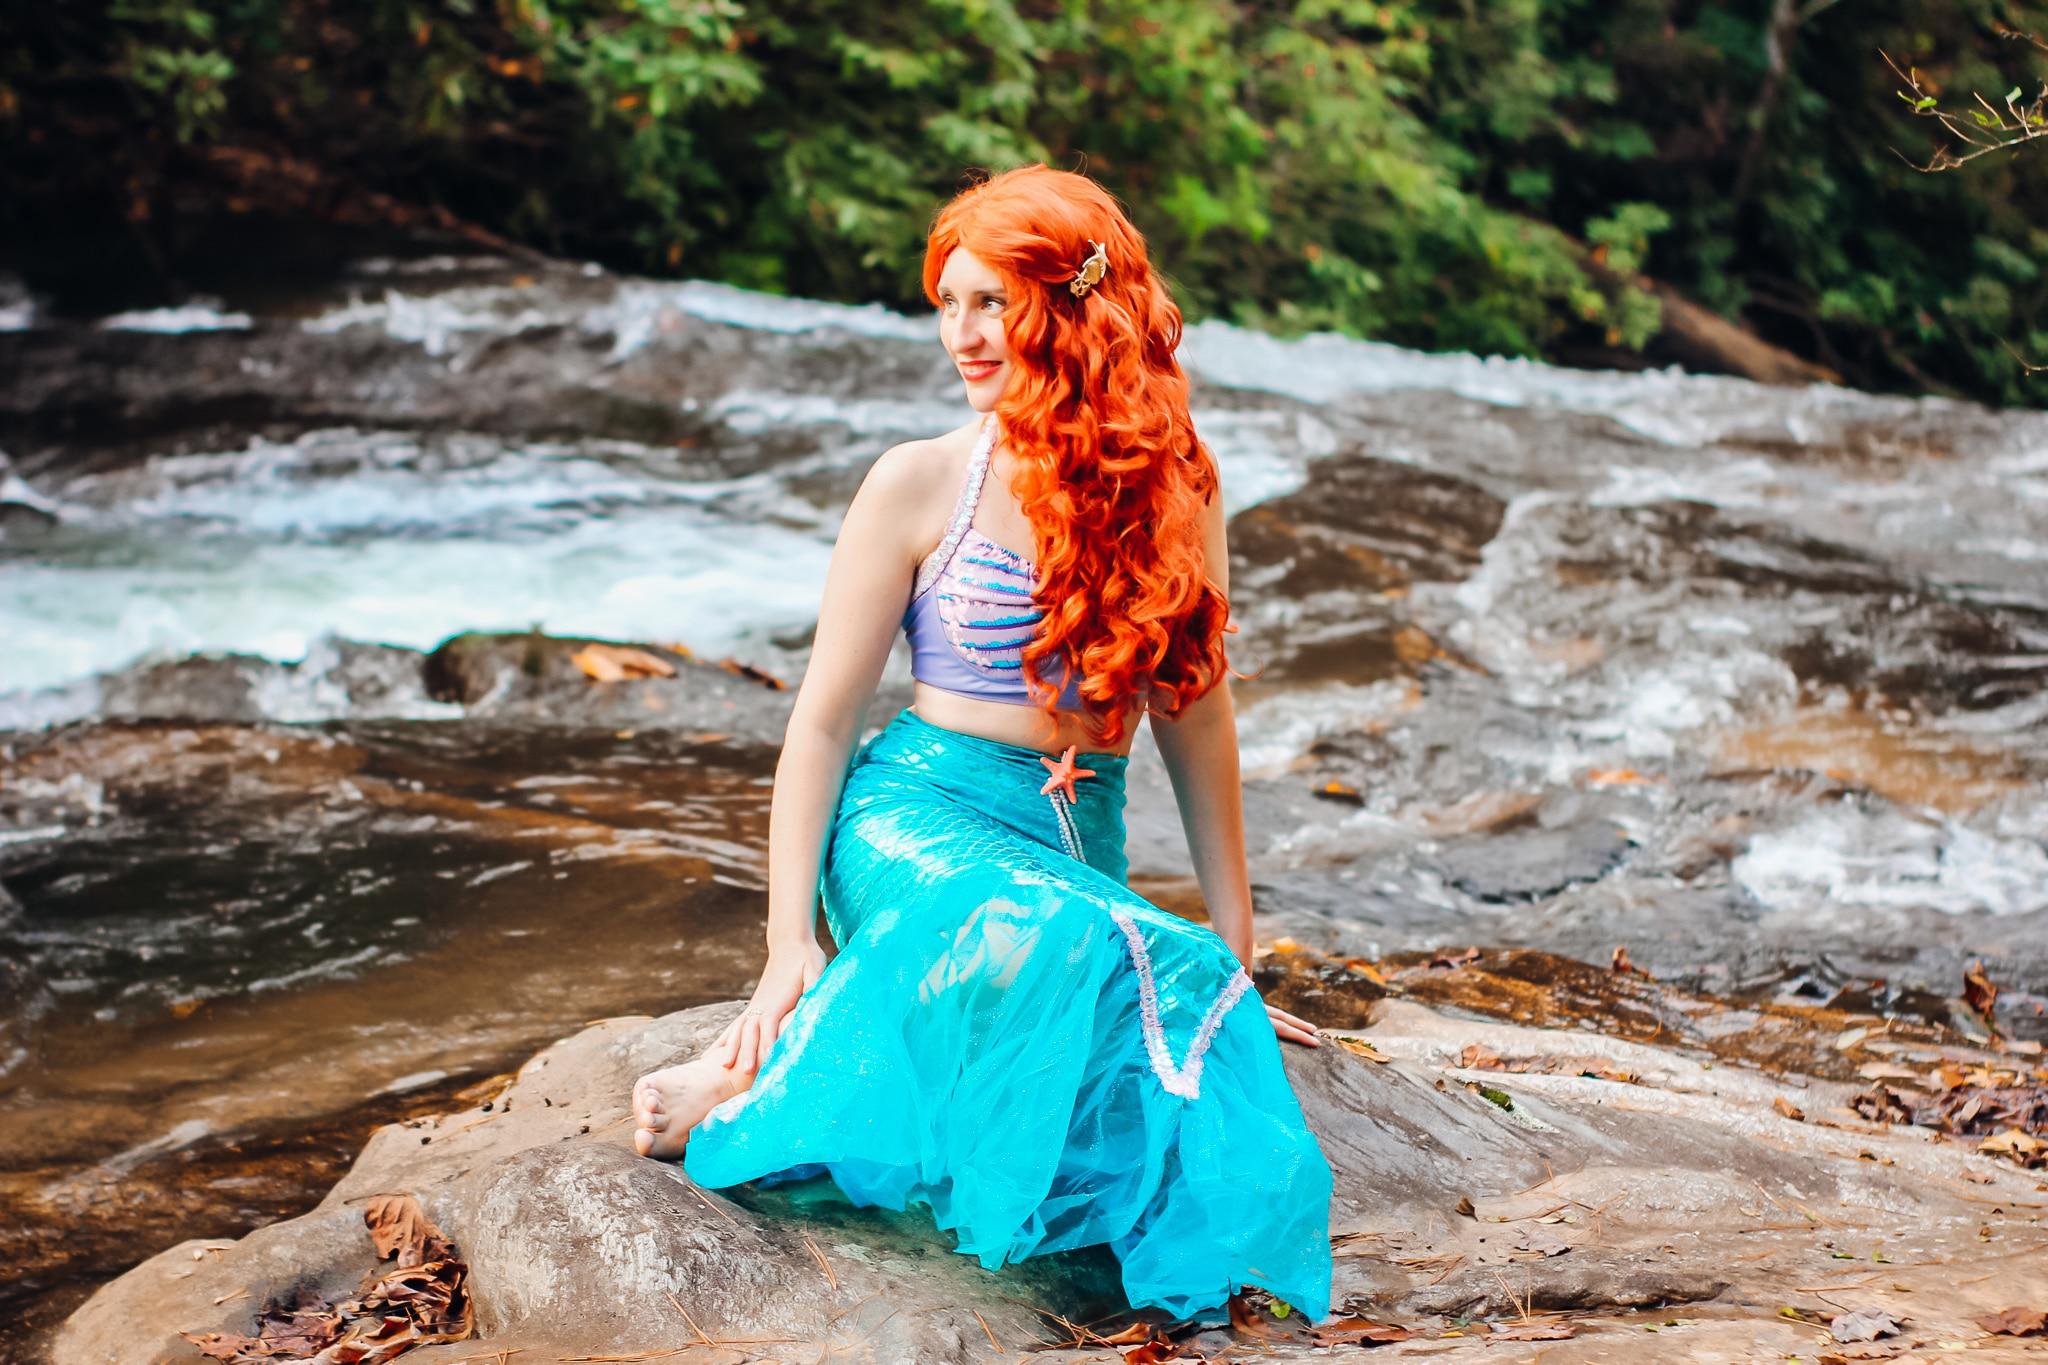 Little Mermaid Halloween Costume Sitting on Rock